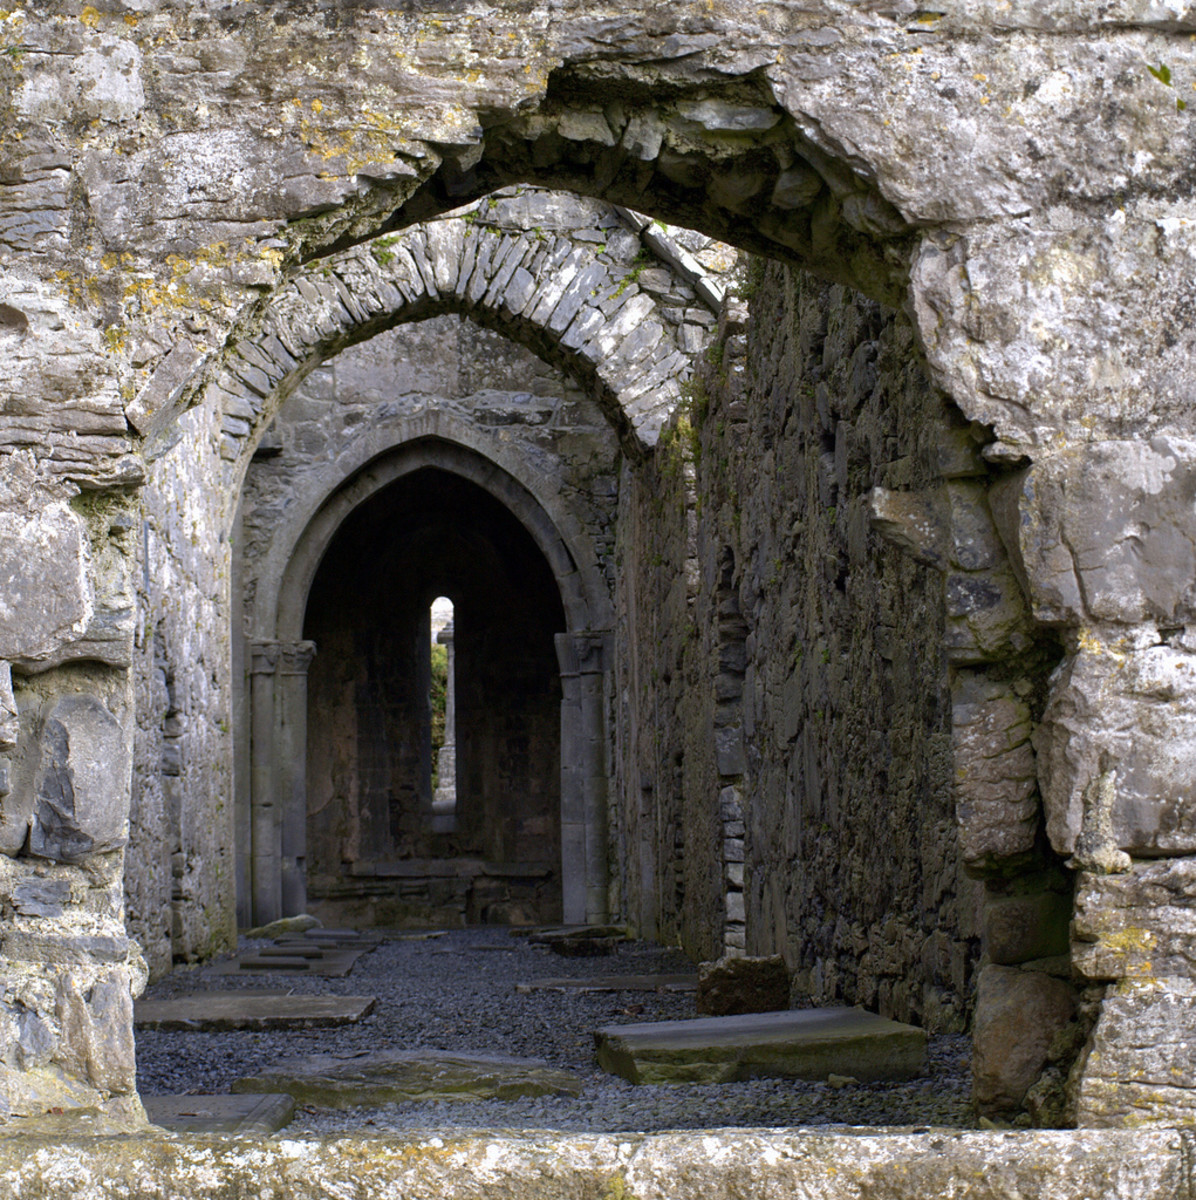 The Burren: Ireland's Karst Landscape